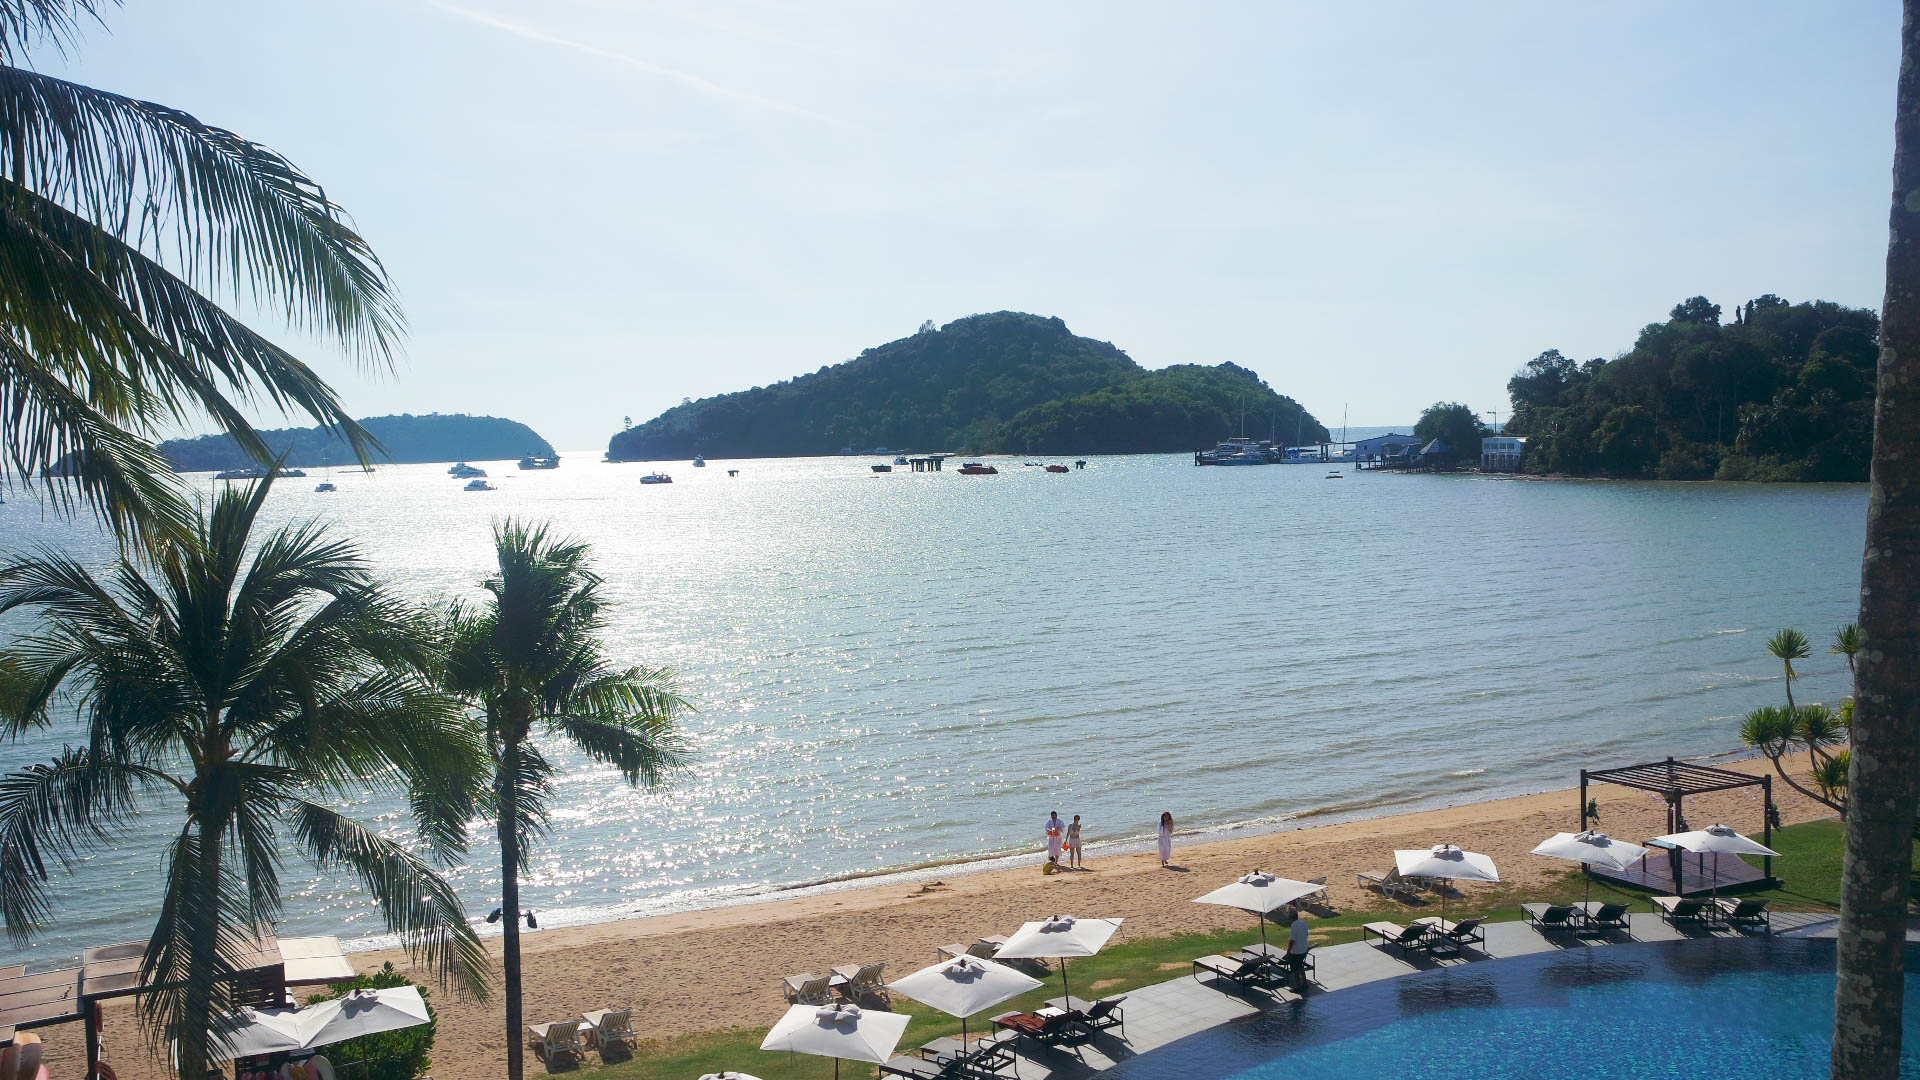 Crowne Plaza Panwa Beach, Phuket